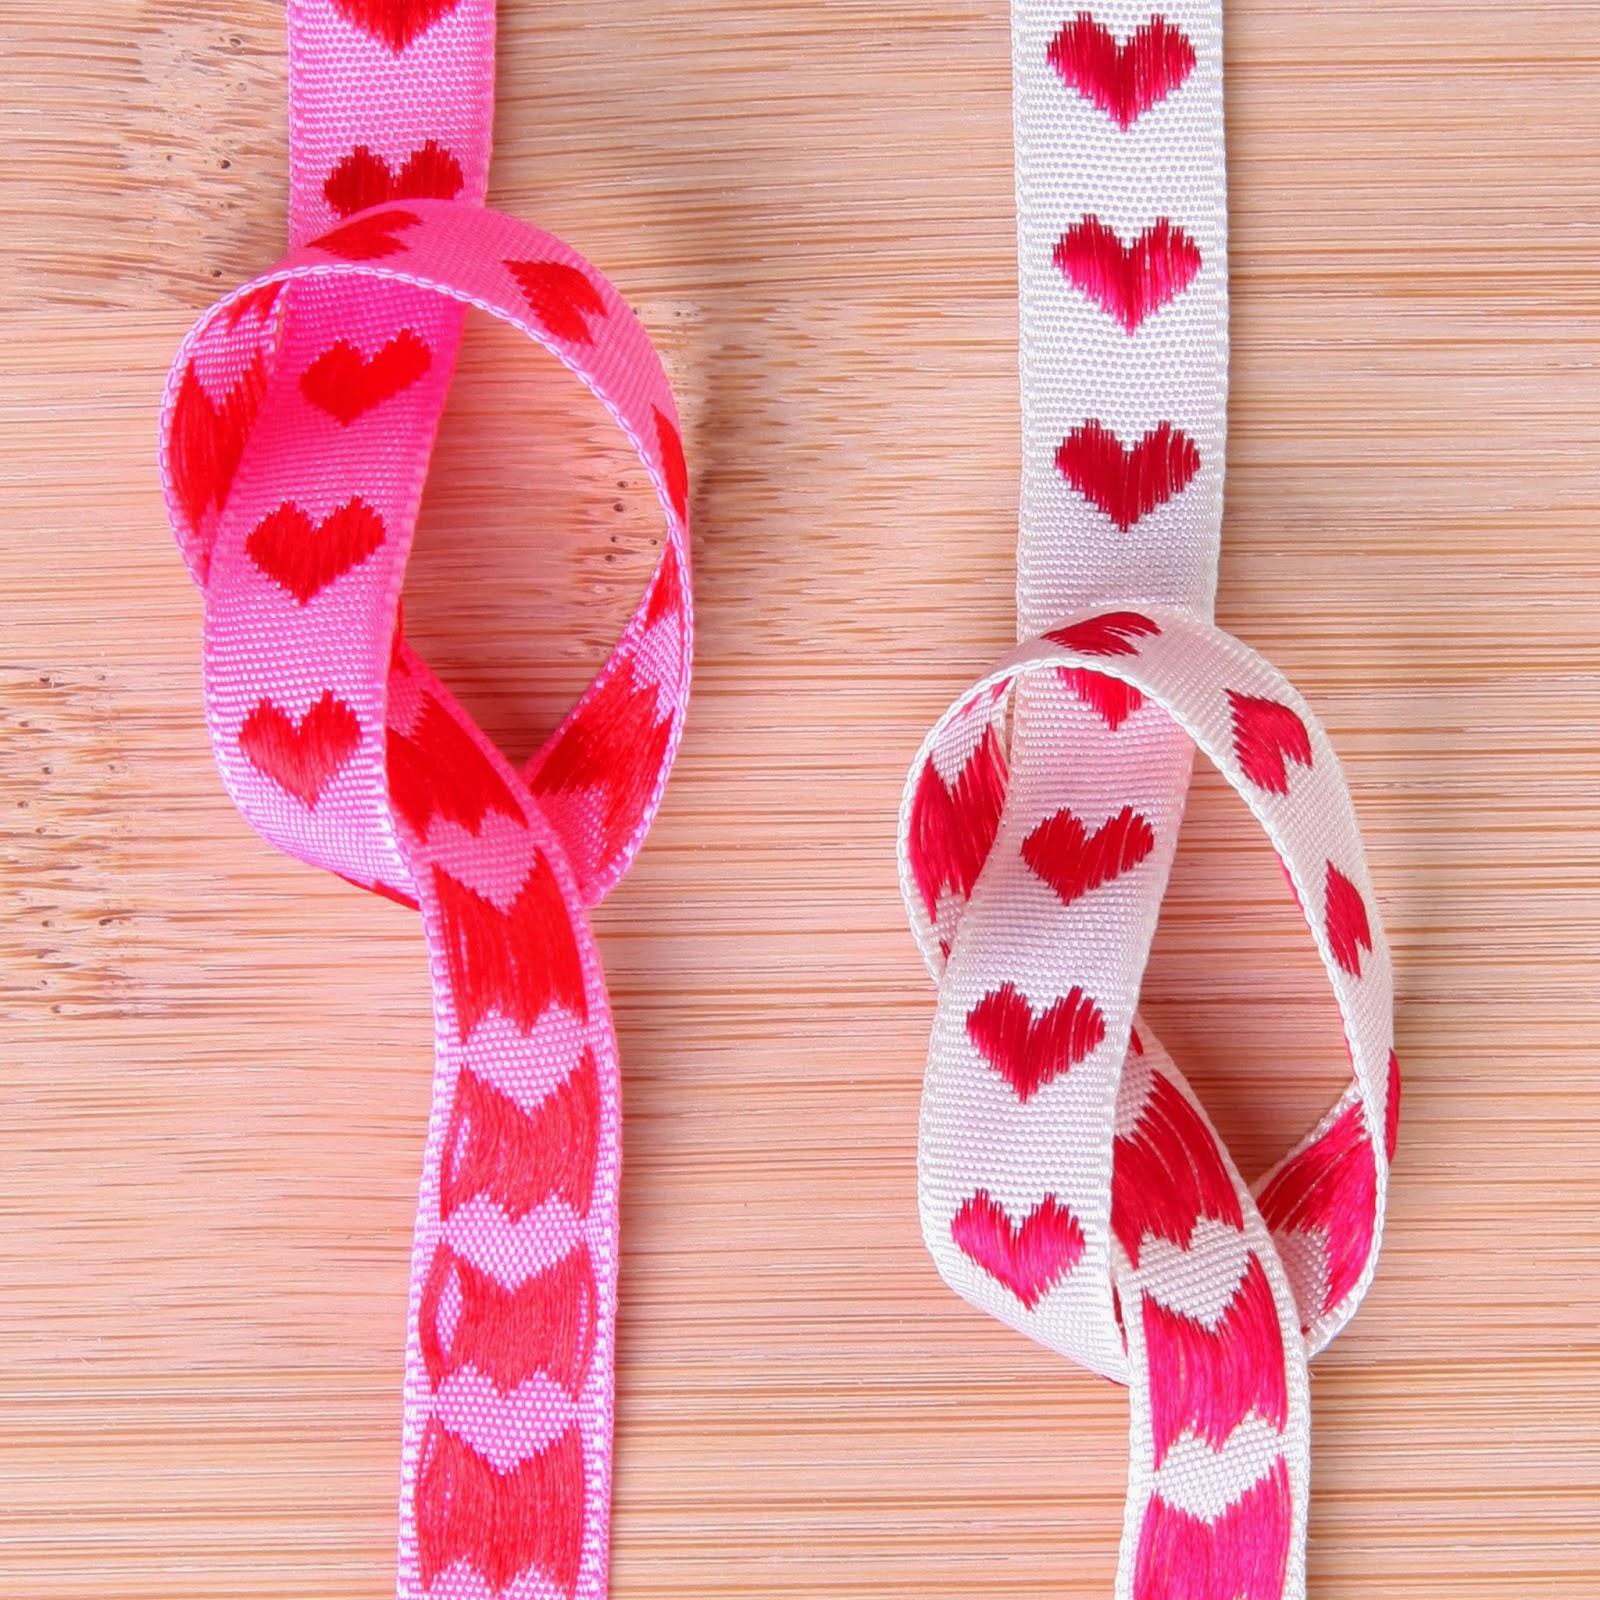 Pyntebånd med hjerter